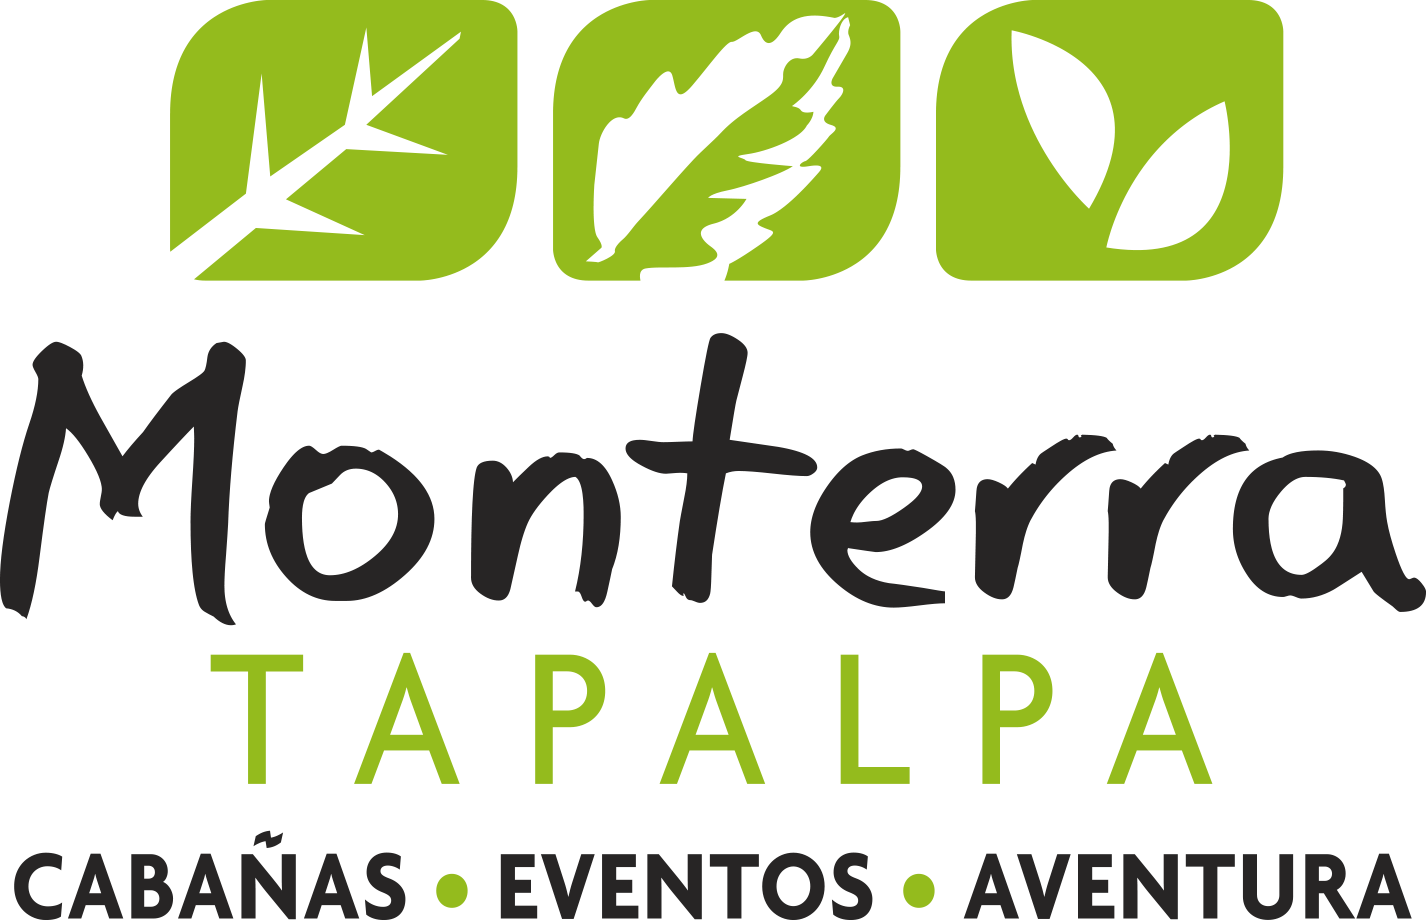 Monterra Tapalpa Cabañas